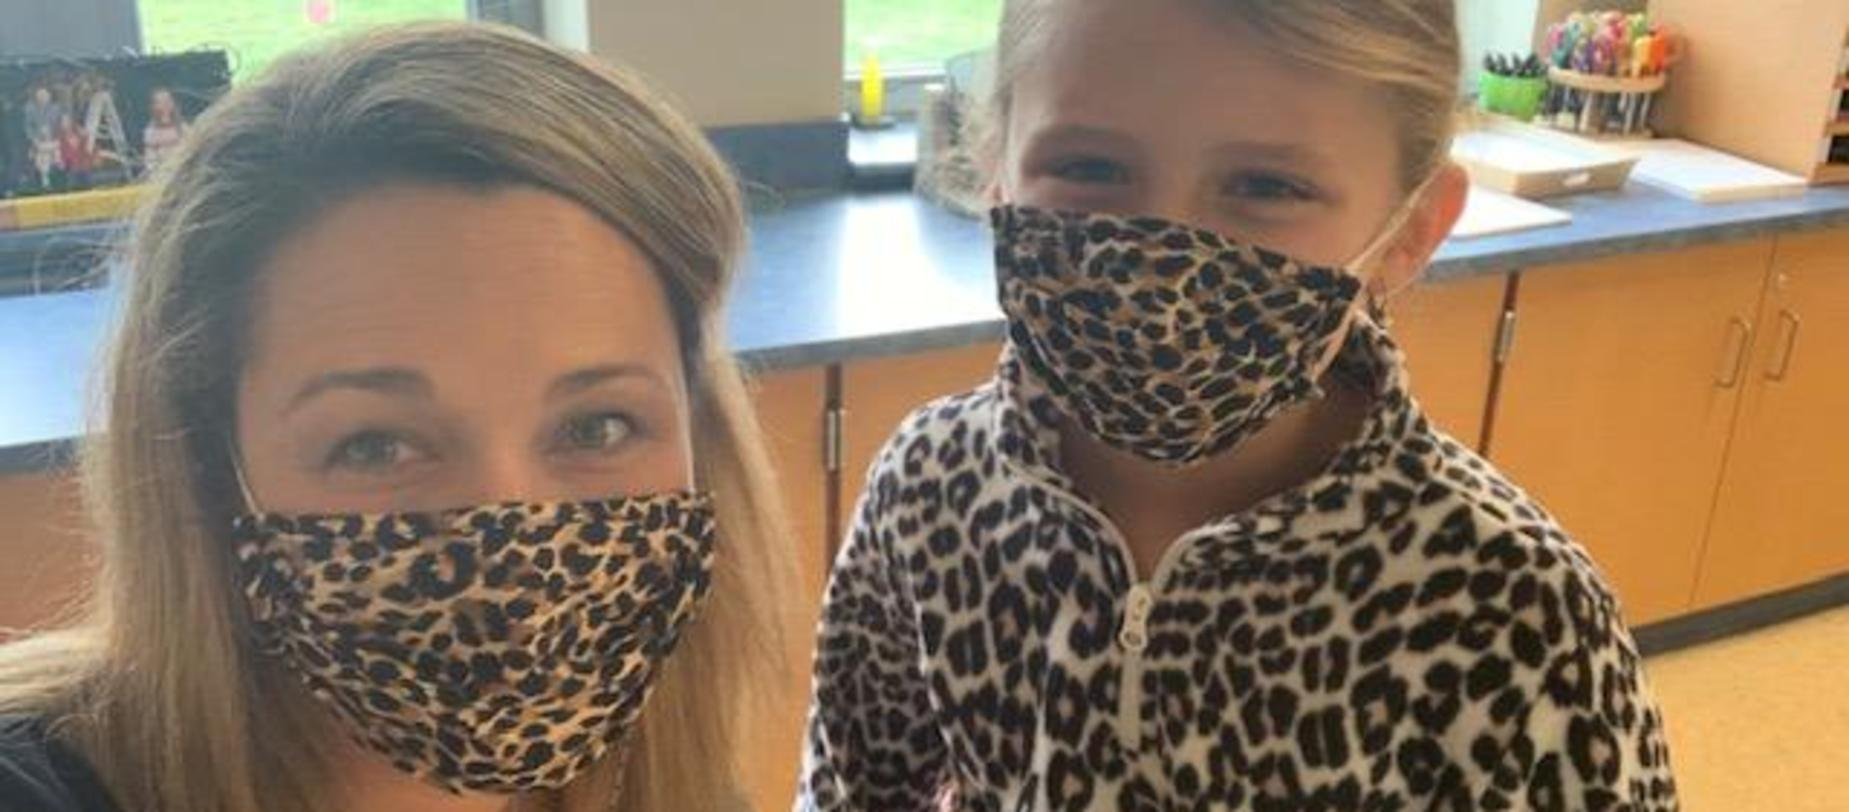 teacher and student wearing matching leopard masks